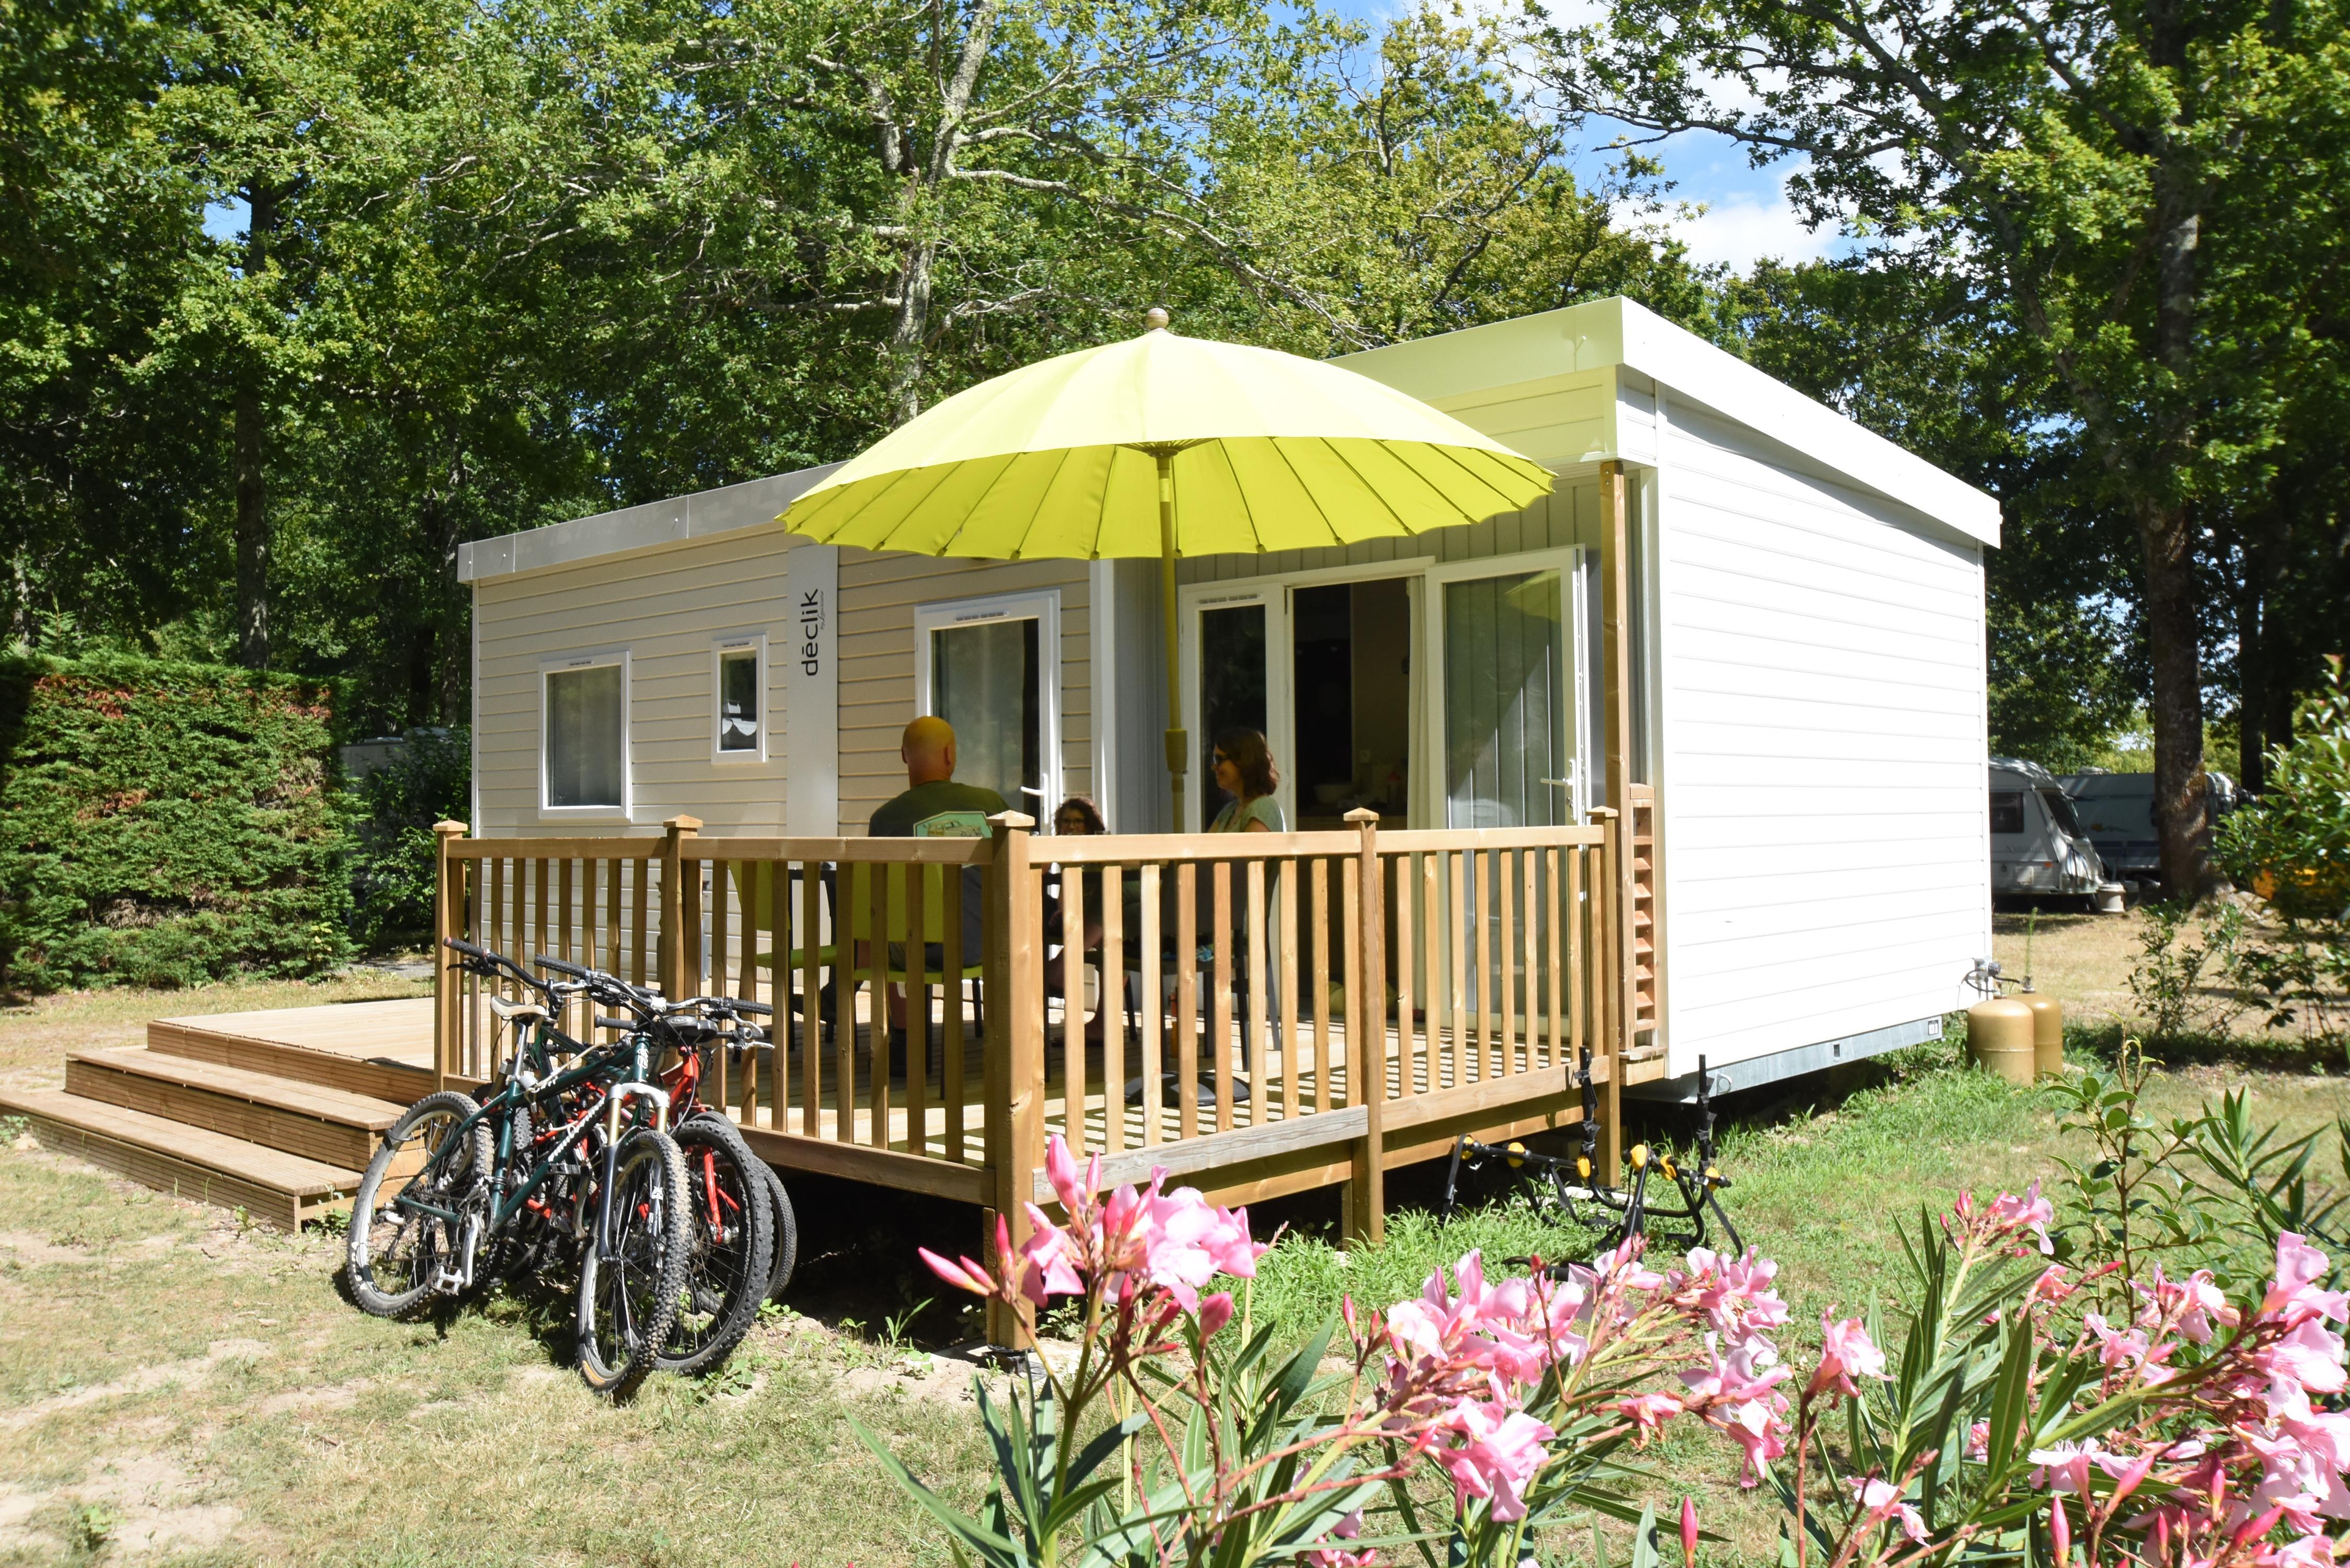 Location - Mobilhome Louisiane Declik - 3 Chambres - Camping Le Logis du Breuil